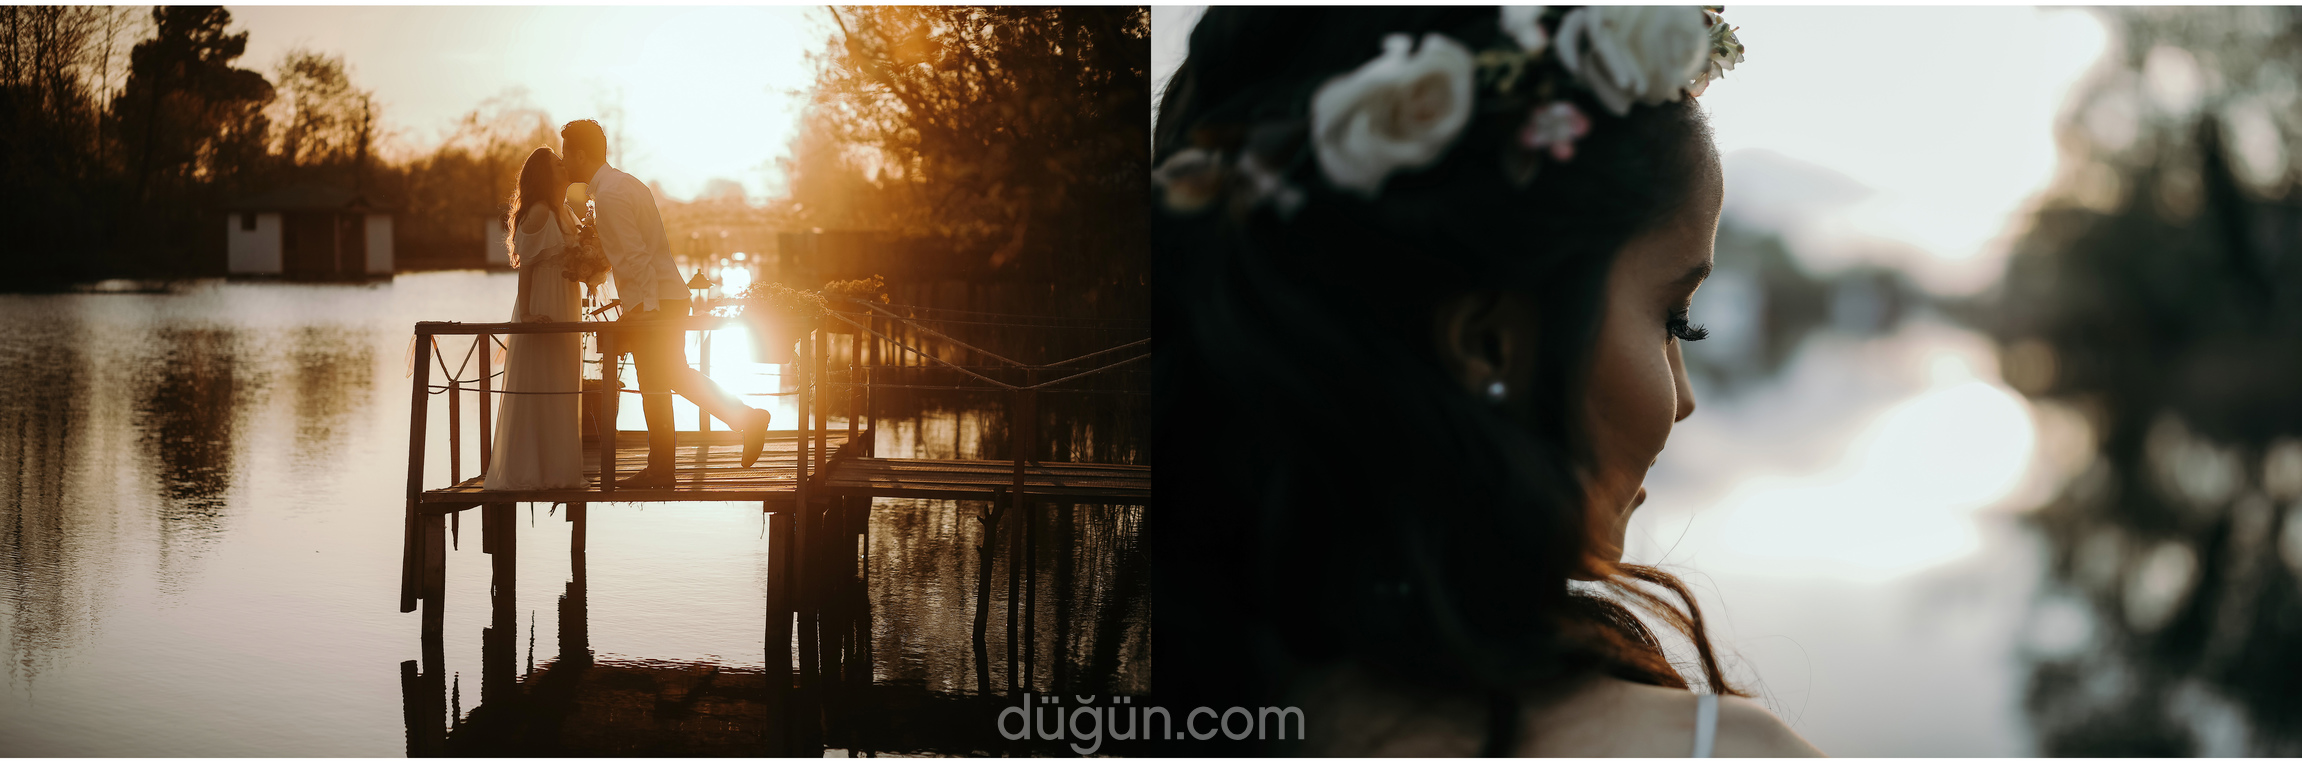 Uğur Kurt Photography